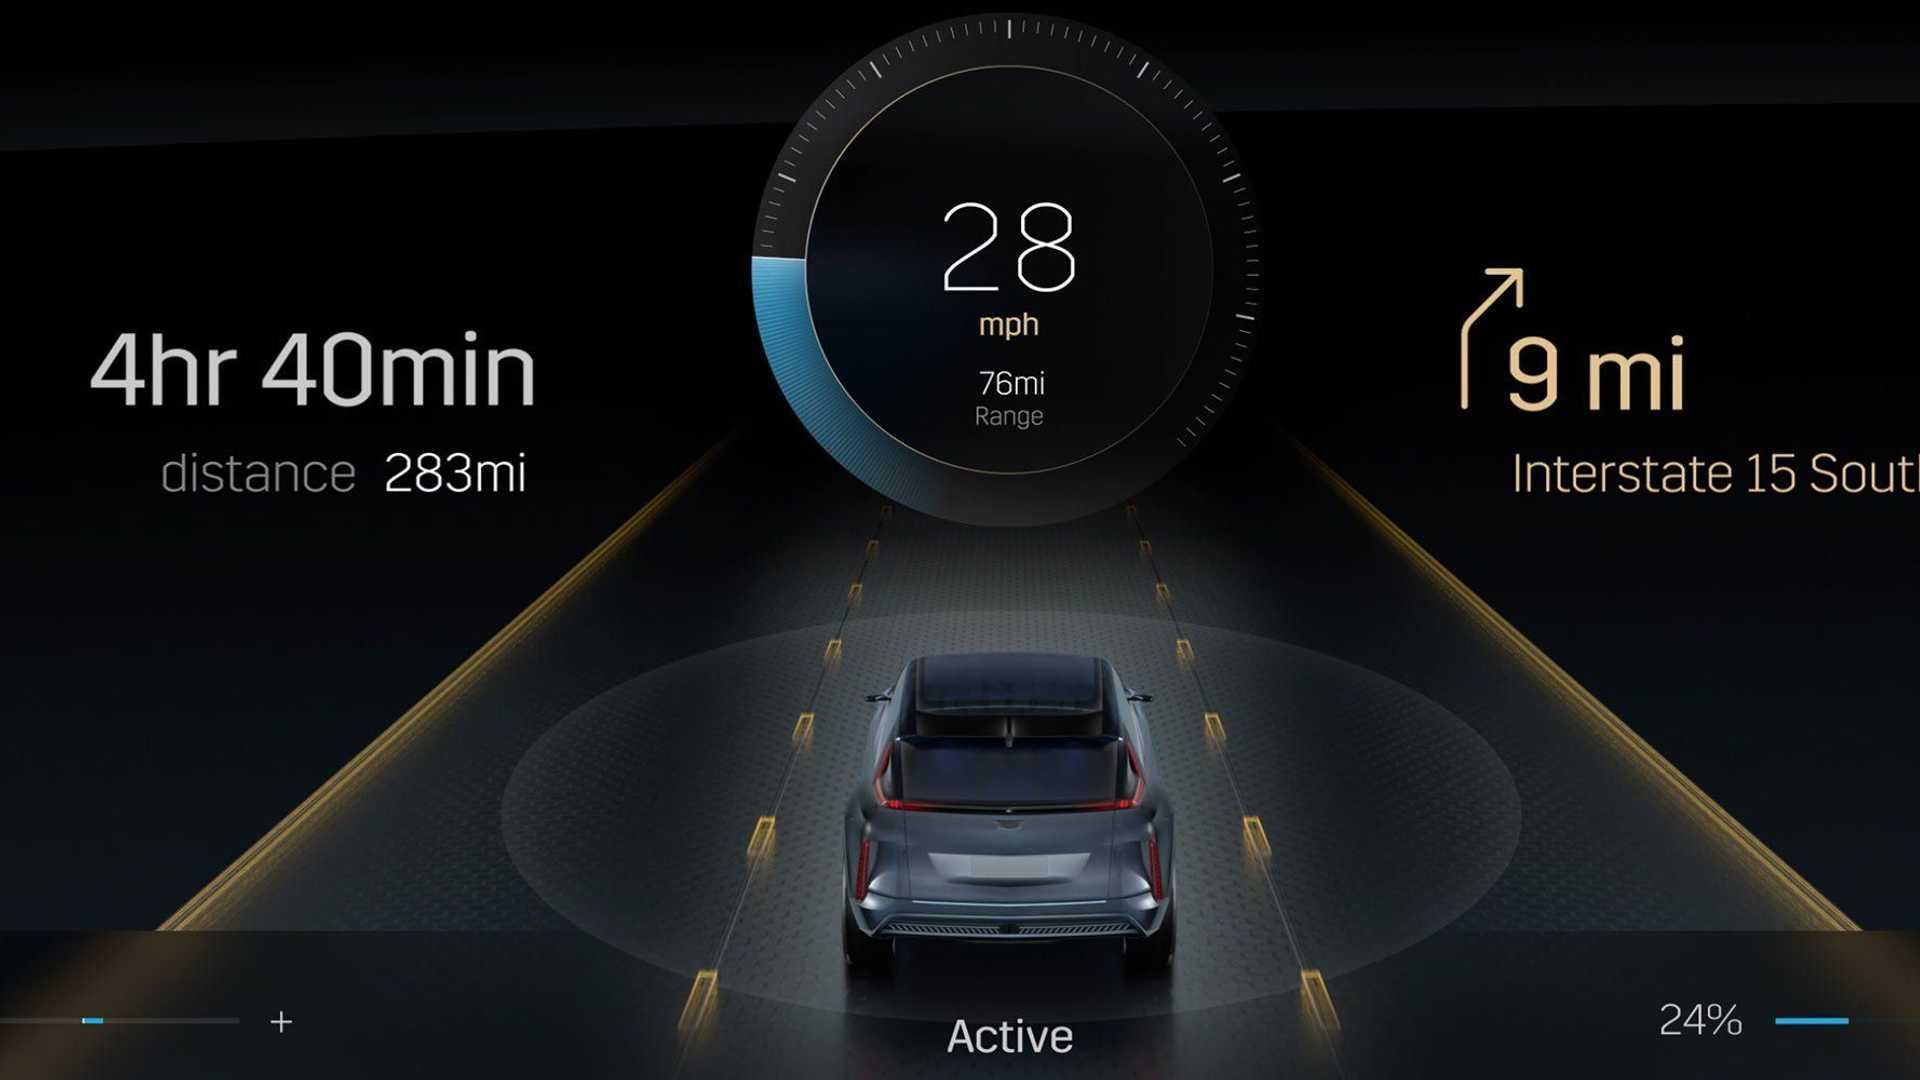 cadillac-lyriq-infotainment-display-speedometer